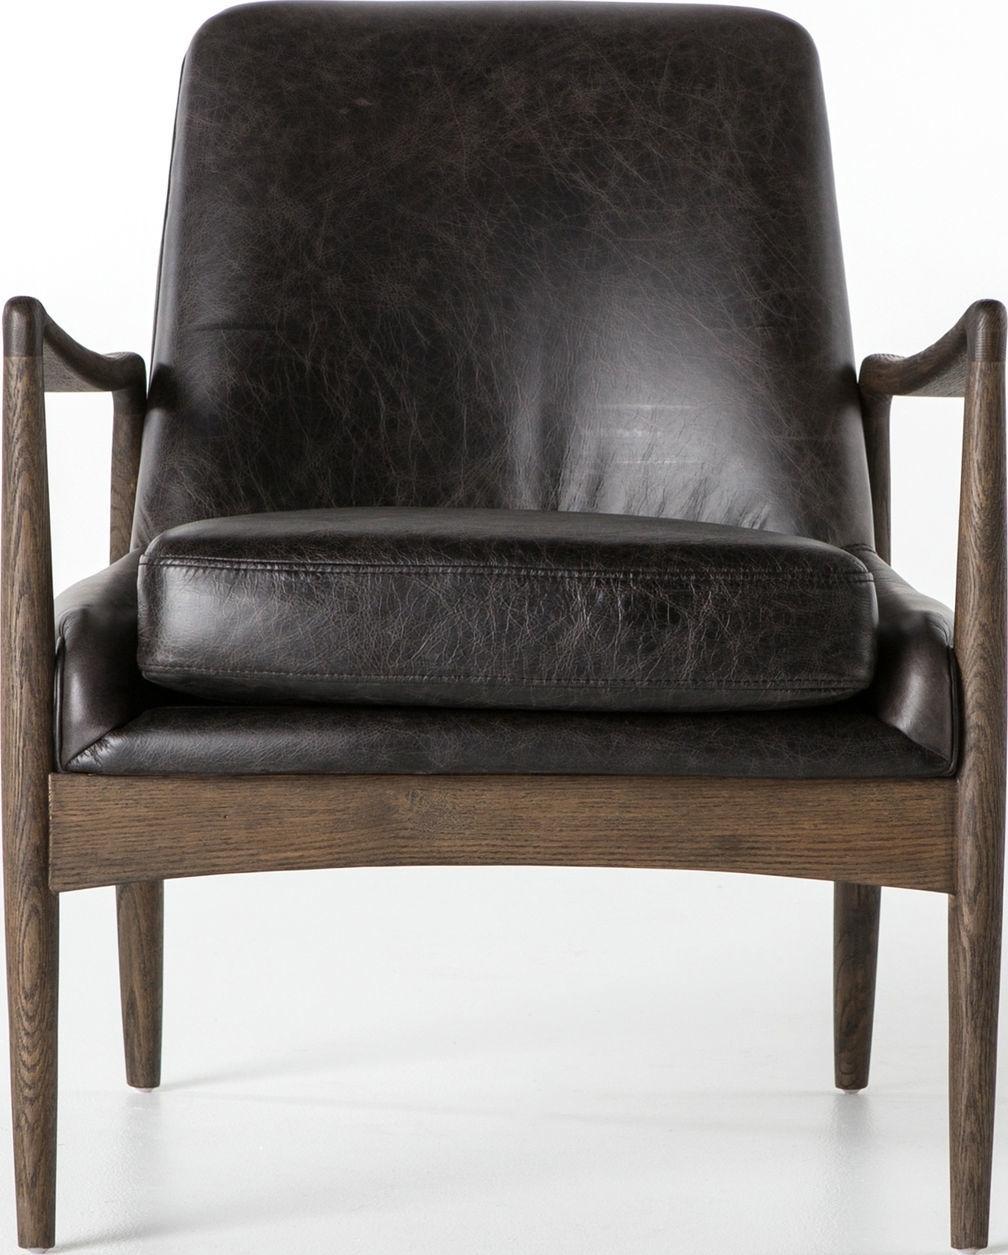 Compass Modern Within Durango Smoke & Warm Cedar Dining Chairs (View 3 of 20)